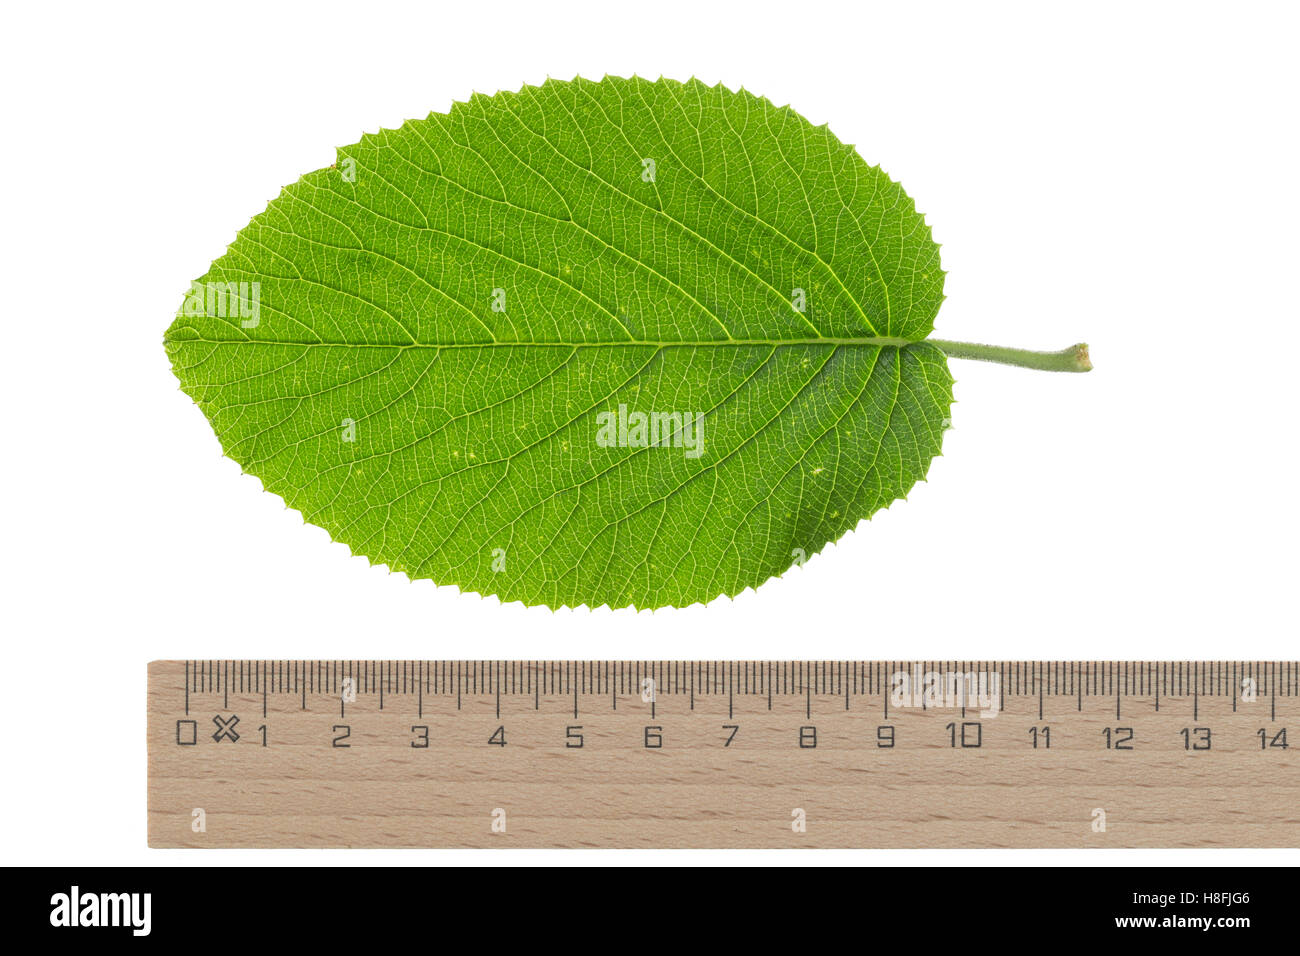 Wolliger Schneeball, Schnee-Ball, Viburnum lantana, Wayfaring Tree, Mansienne, Viorne lantane. Blatt, Blätter, - Stock Image